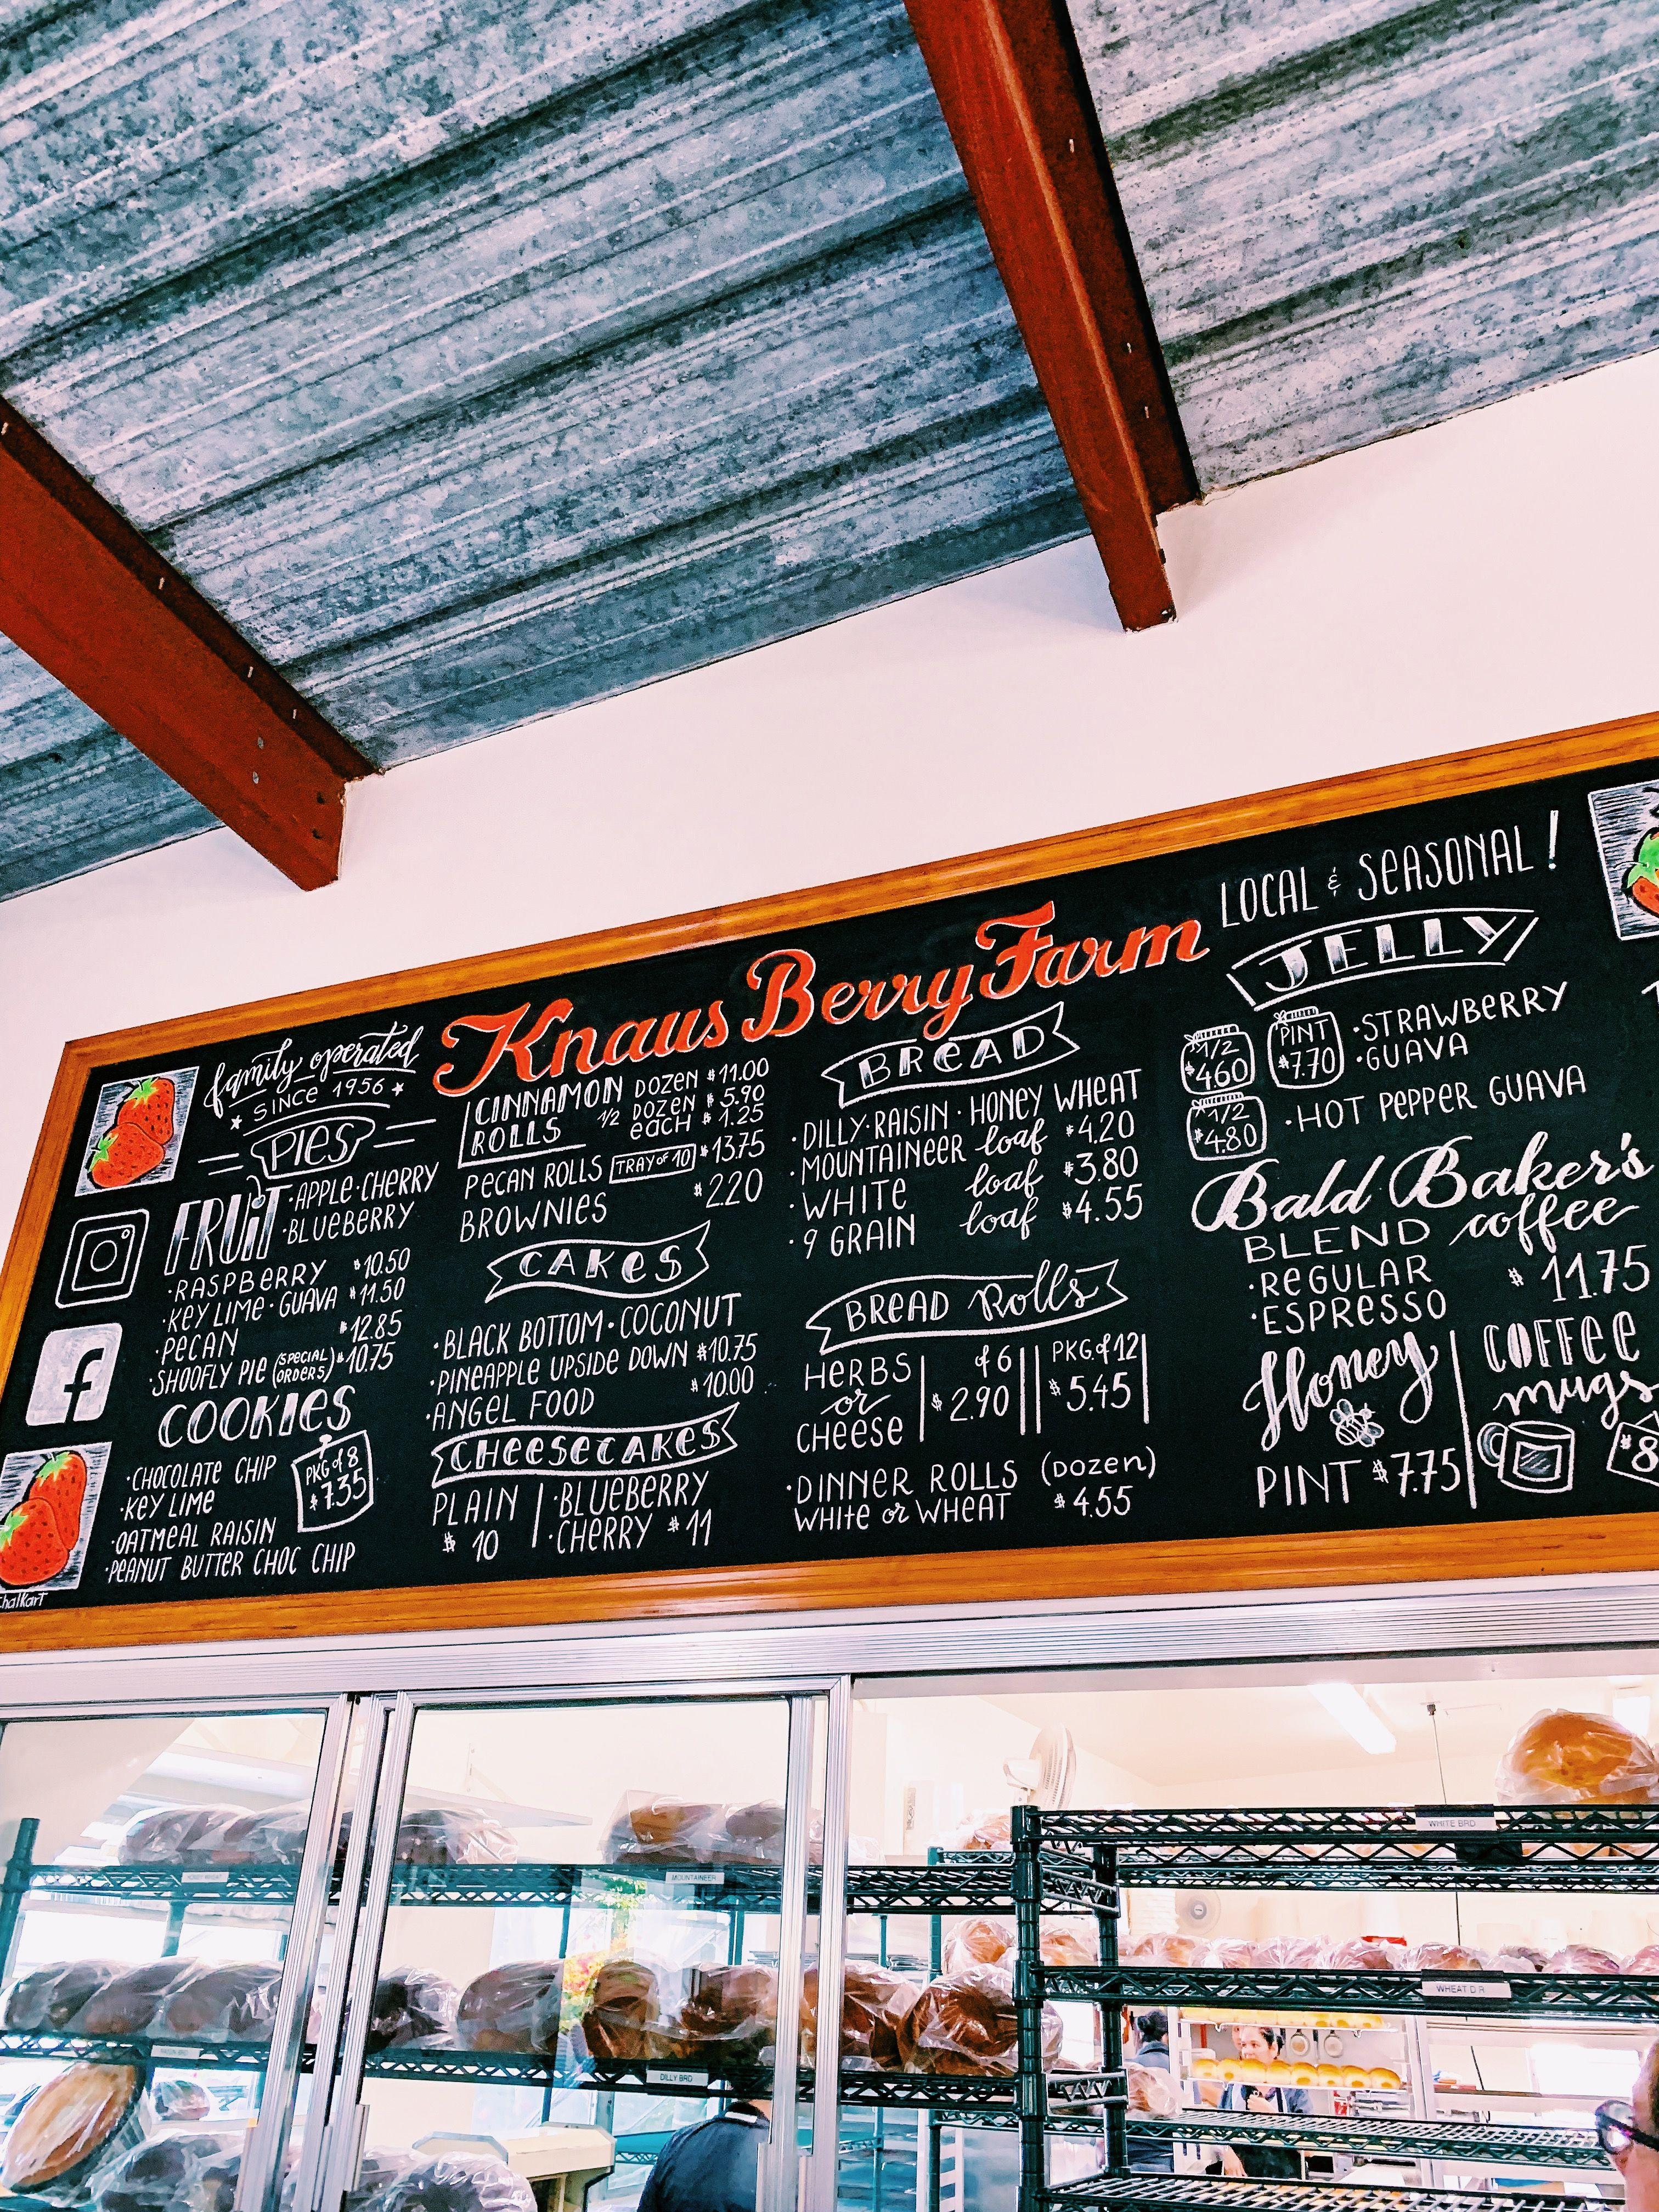 Knaus Berry Farm Bakery Interior Homestead Florida Bakery Cakes